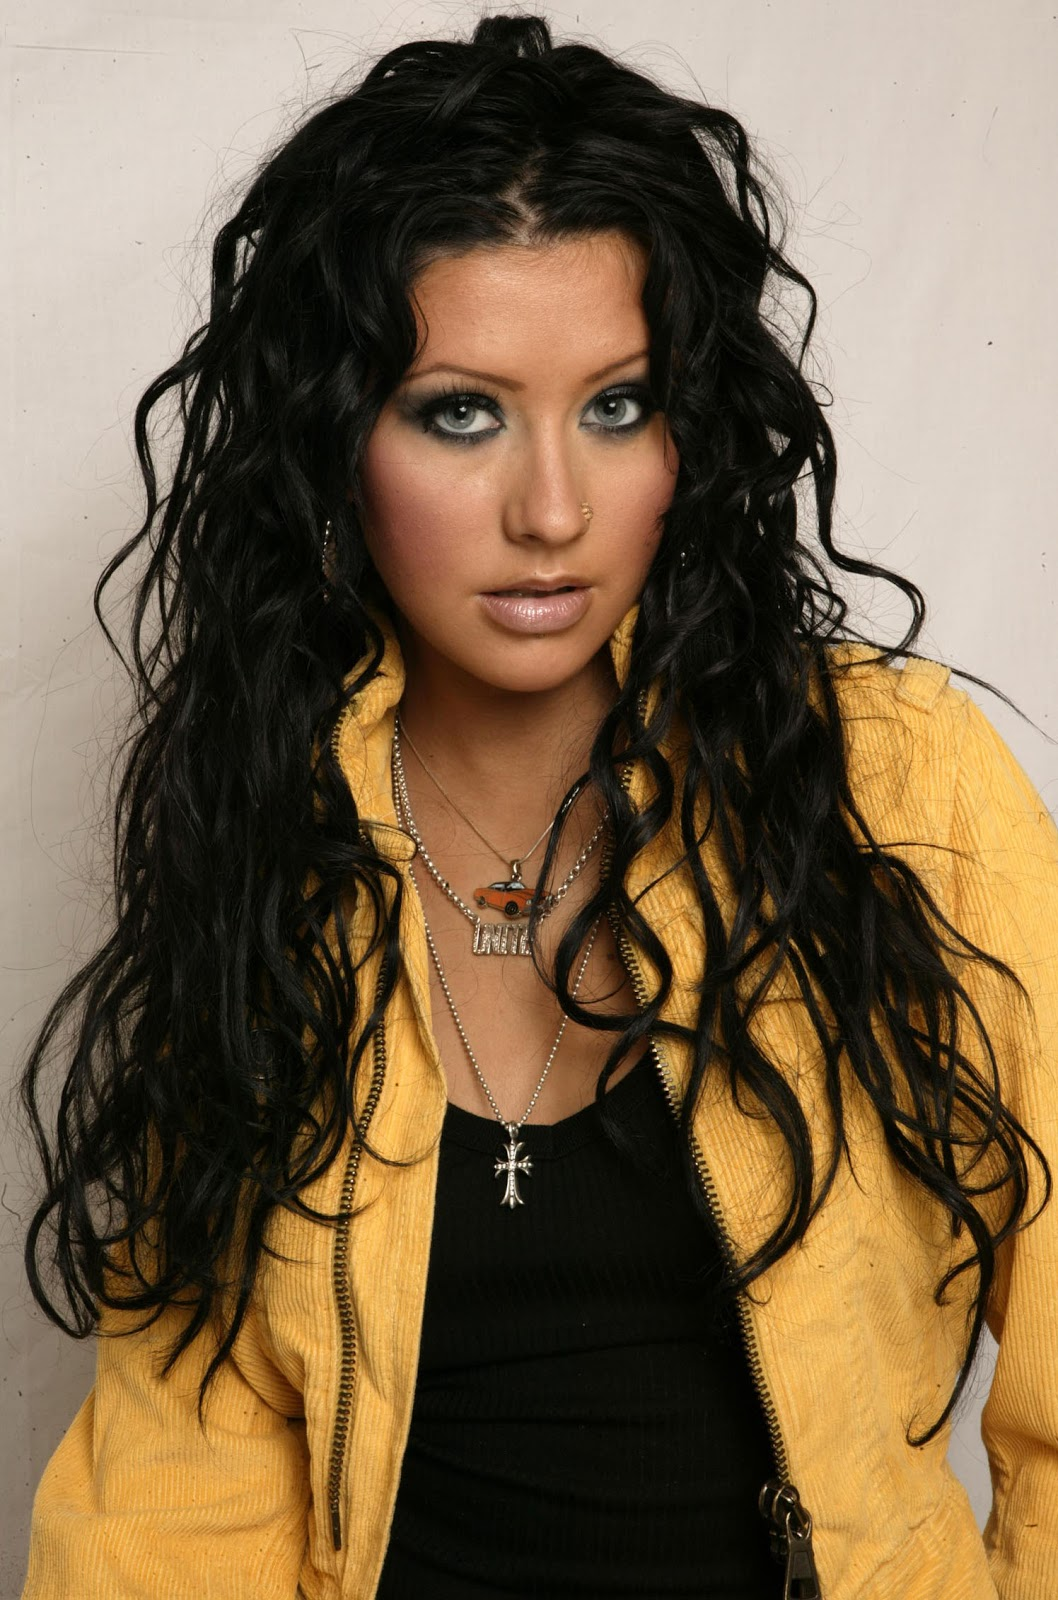 http://2.bp.blogspot.com/-CLqqVSPPYvk/UHq_L5XwsoI/AAAAAAAAAbo/miuxRazBiak/s1600/Christina_Aguilera_0114.jpg